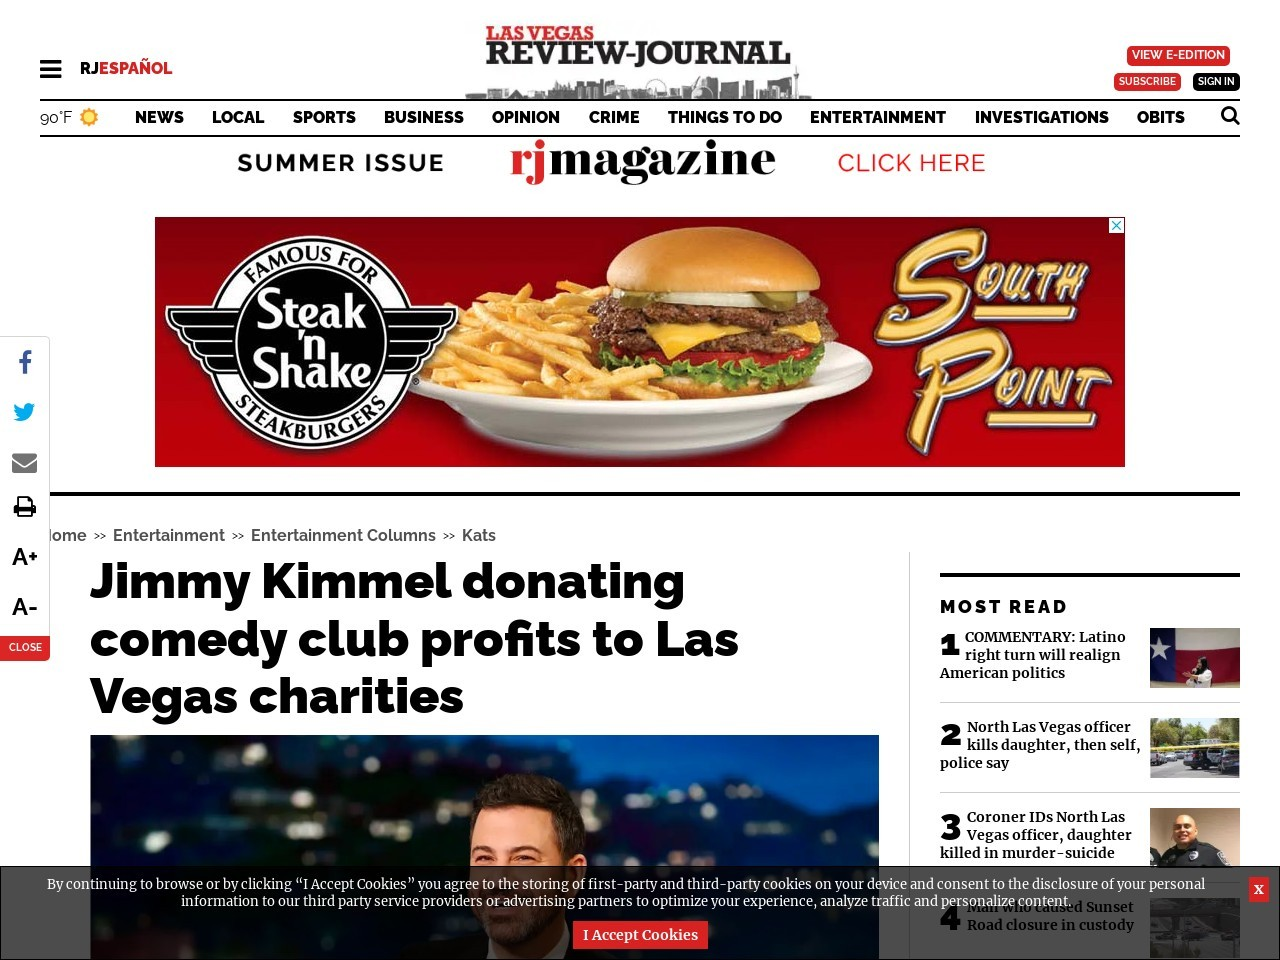 Jimmy Kimmel donating comedy club profits to Las Vegas charities